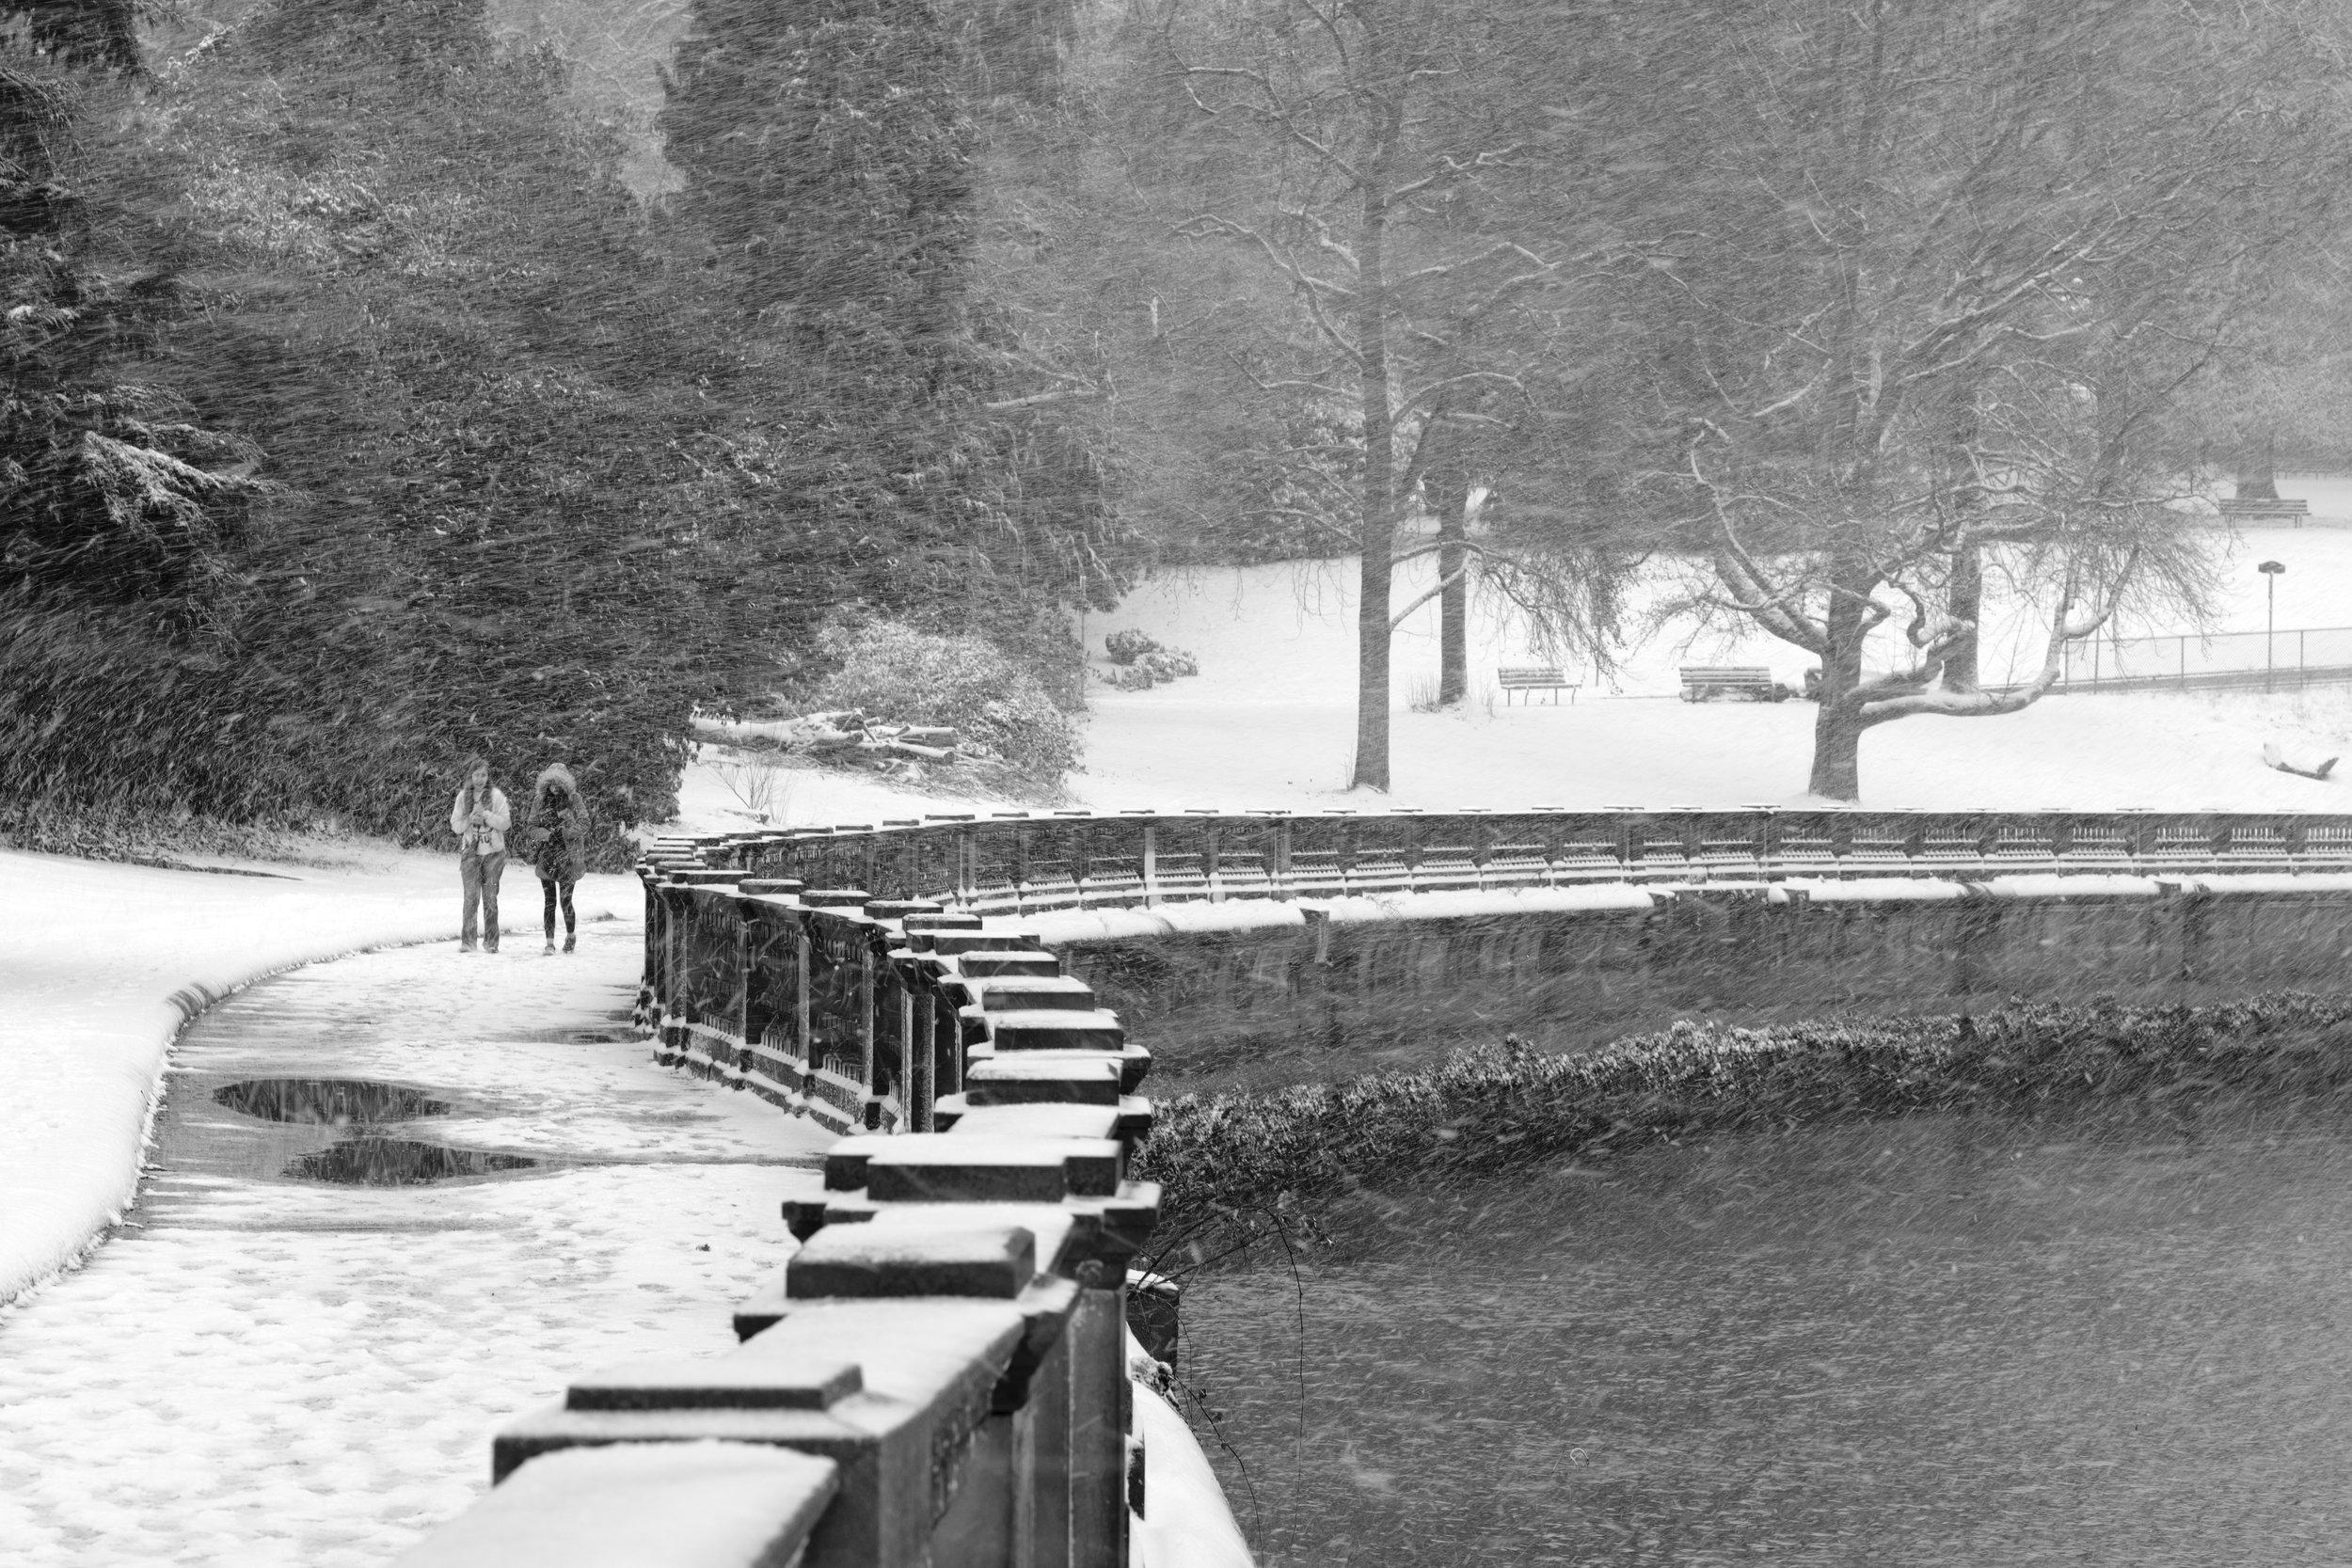 DSCF0062vancouver_snow_day.jpg